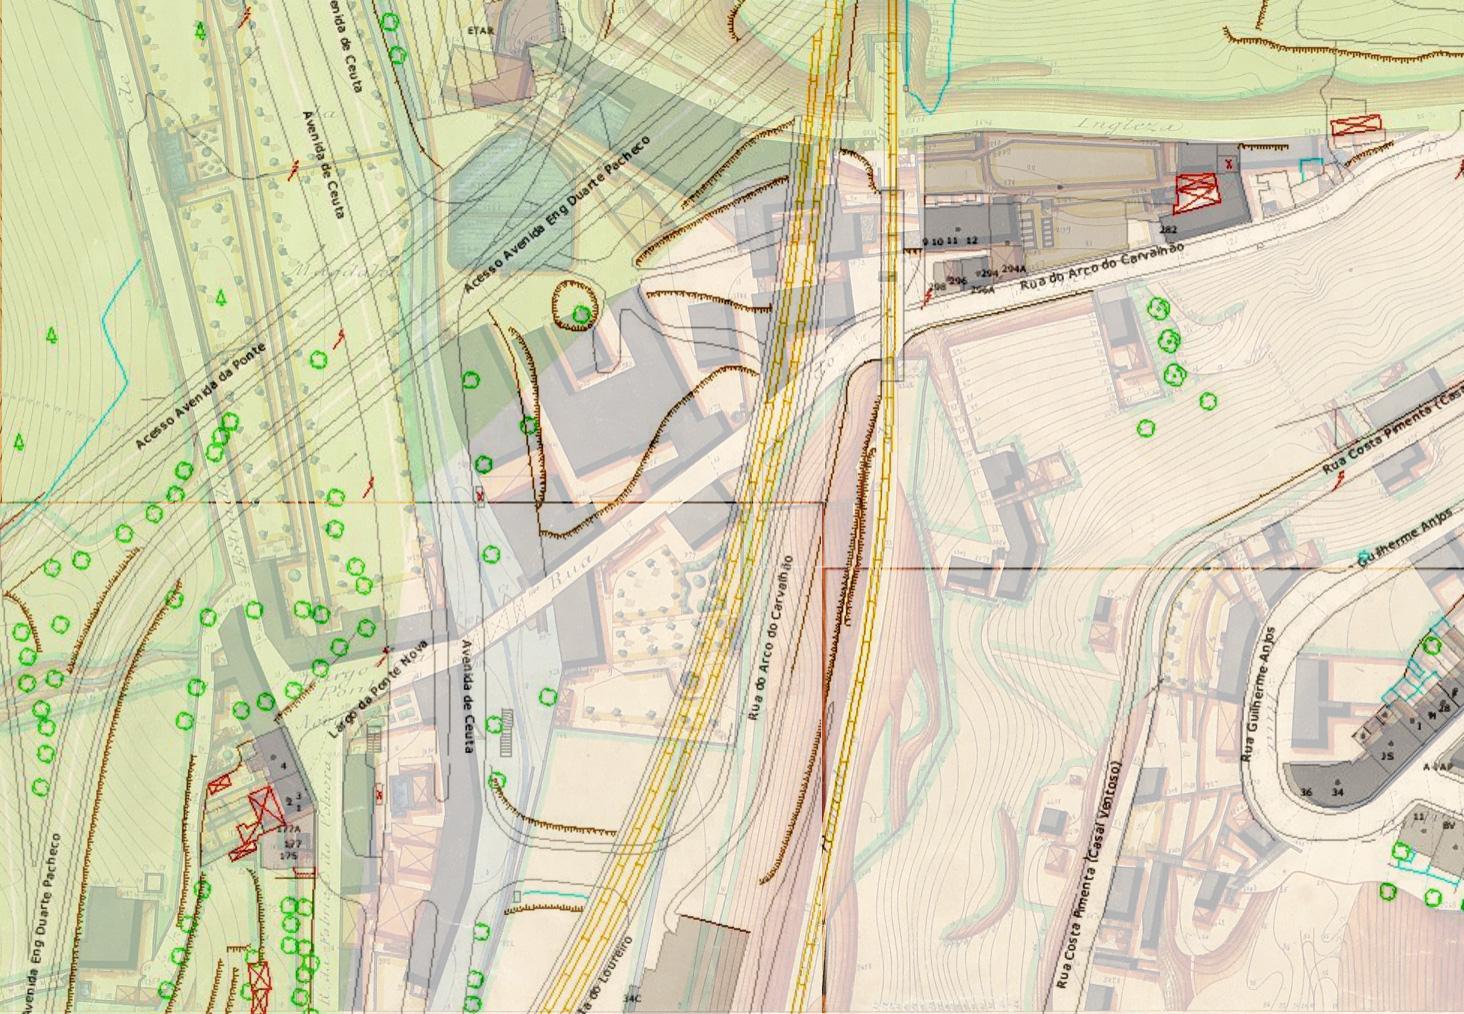 lisboa interactiva mapa Considerações sobre o lugar da Ponte Nova   Bic Laranja lisboa interactiva mapa